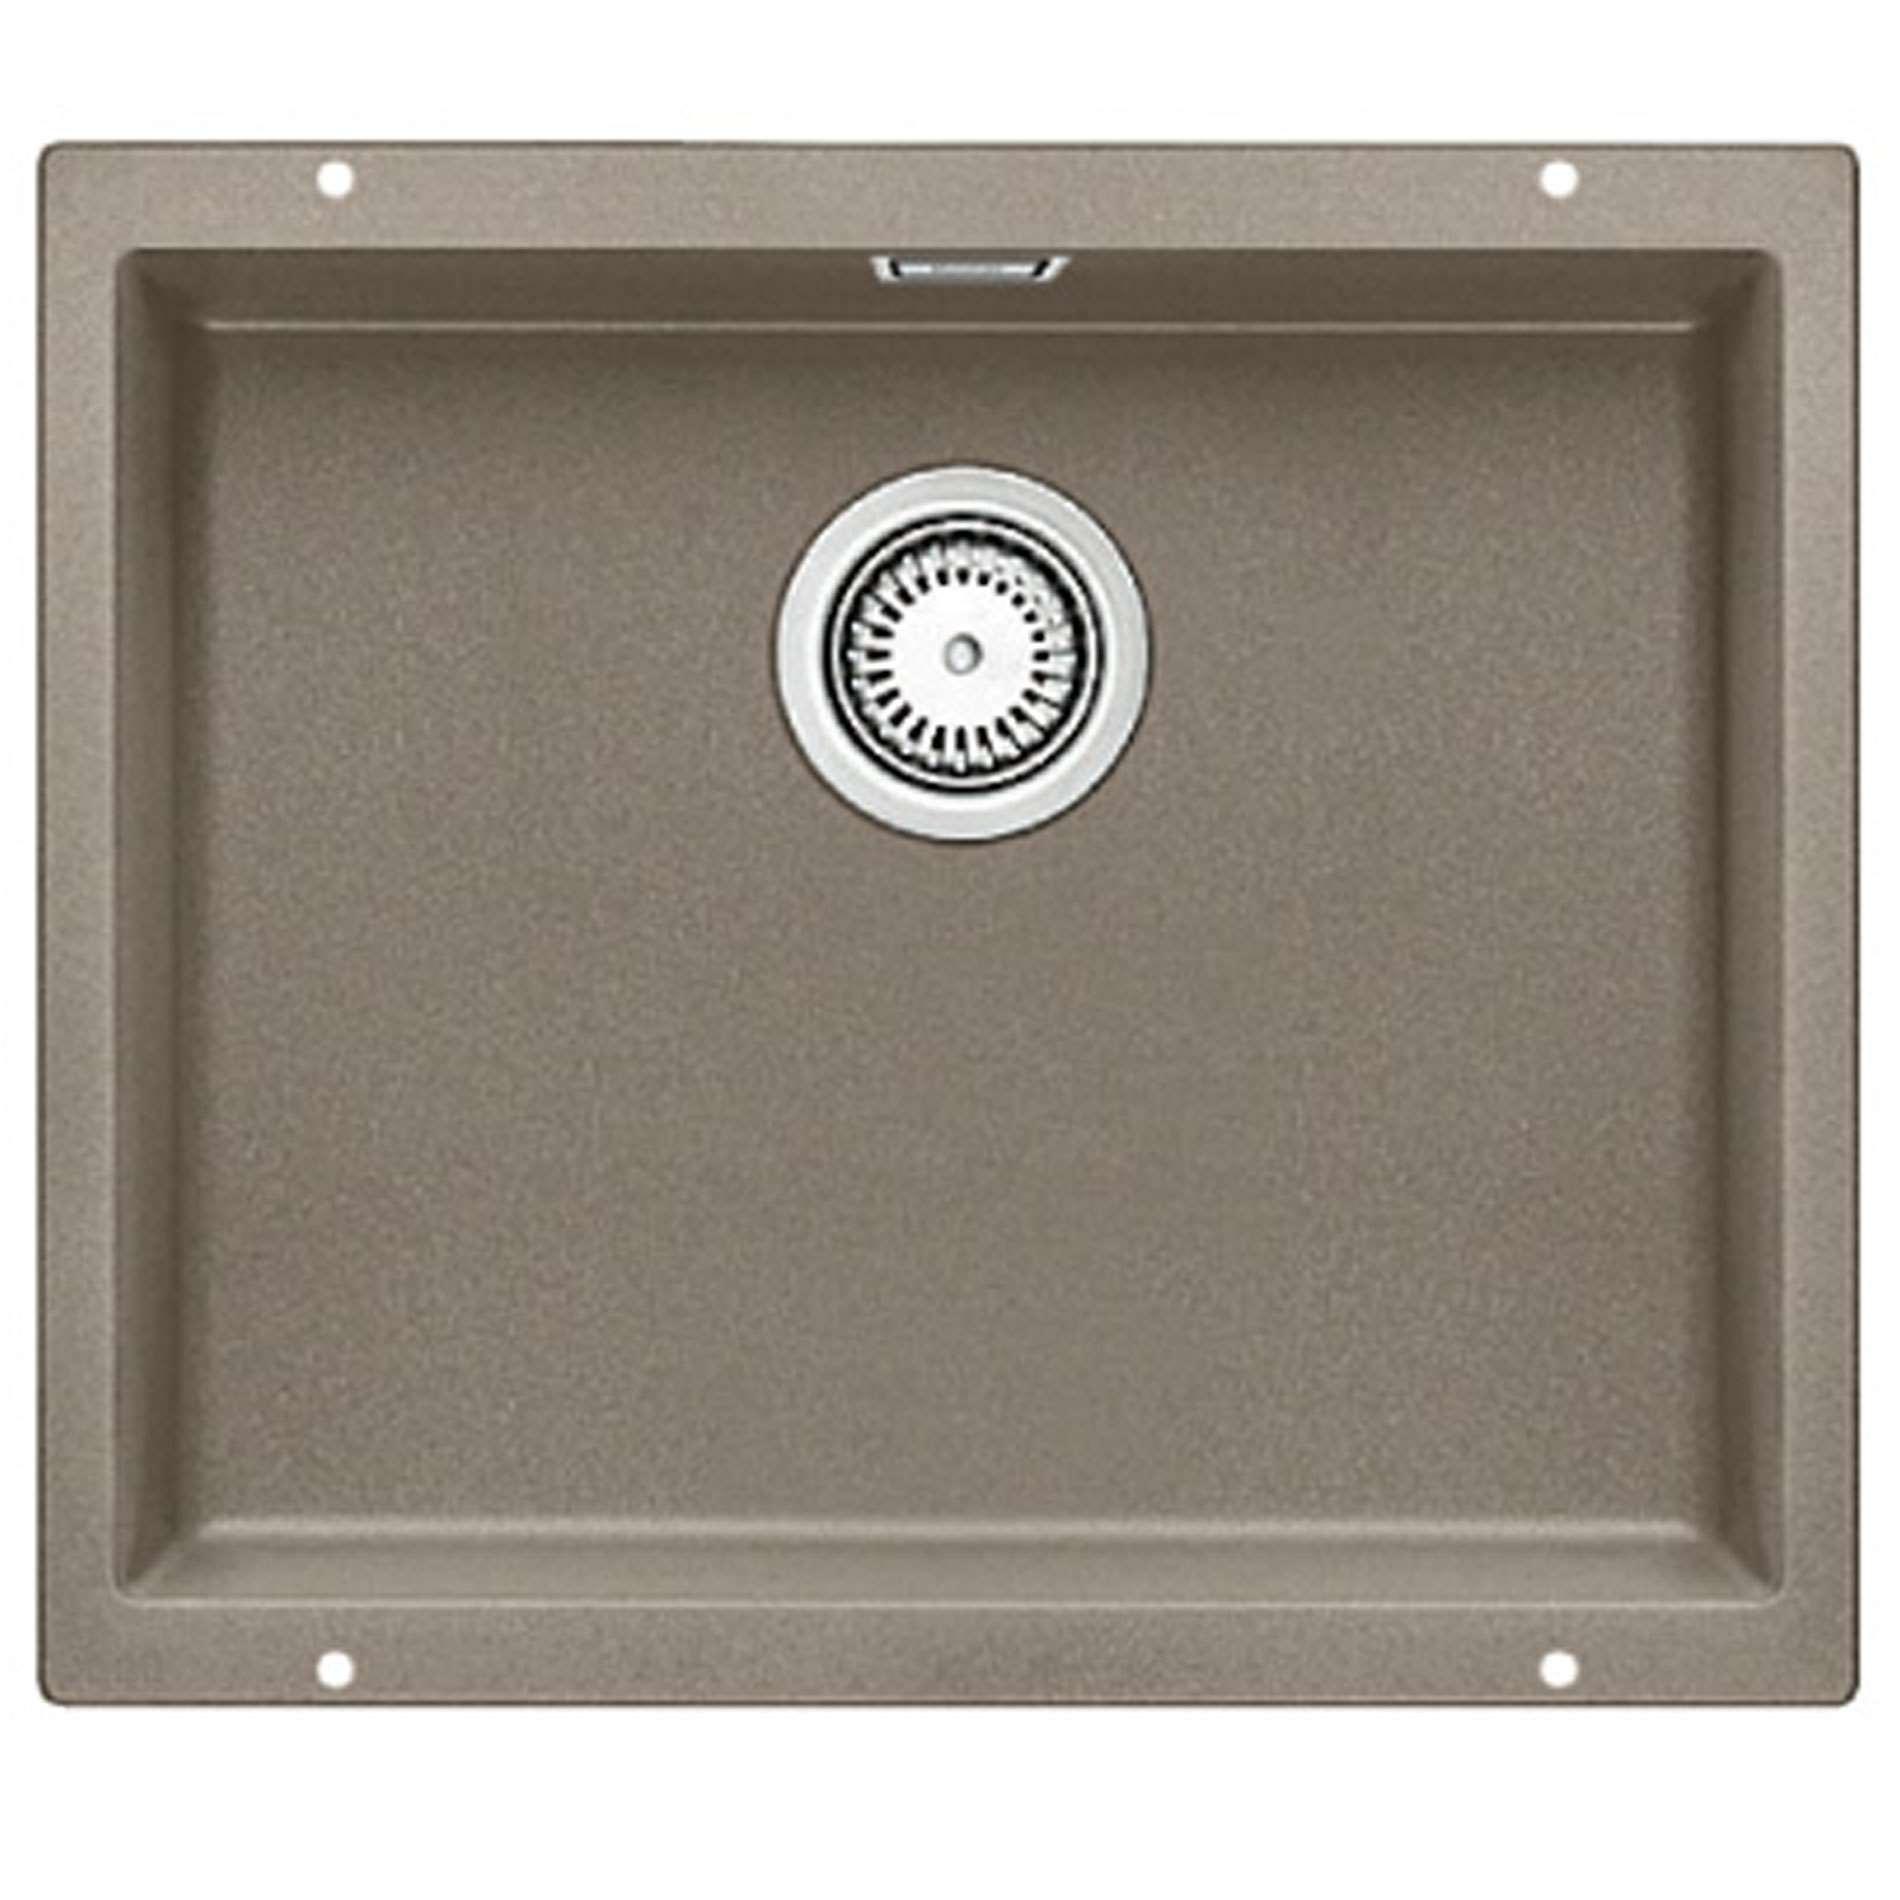 blanco subline 500 u tartufo silgranit sink kitchen sinks taps. Black Bedroom Furniture Sets. Home Design Ideas